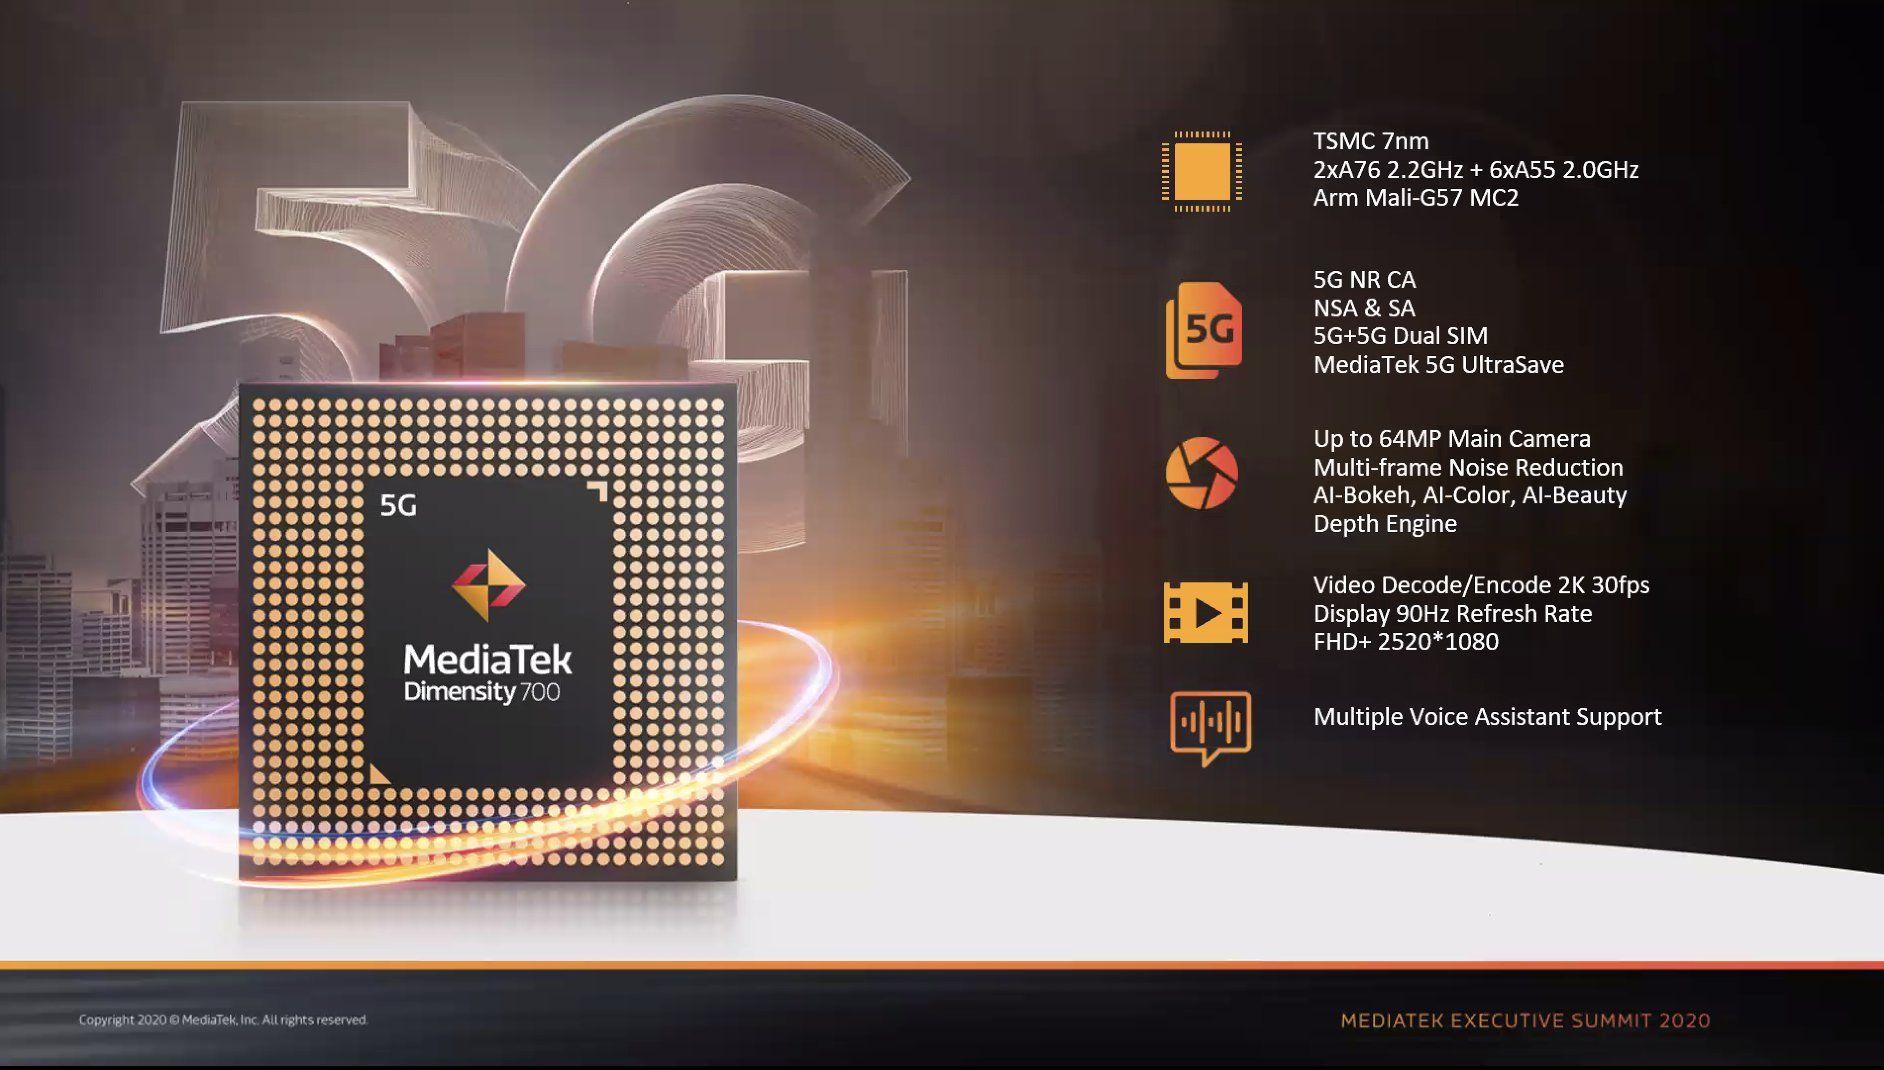 MediaTek Dimensity 700を発表、7nm FinFET製造プロセスの5G通信対応ミドルレンジ製品